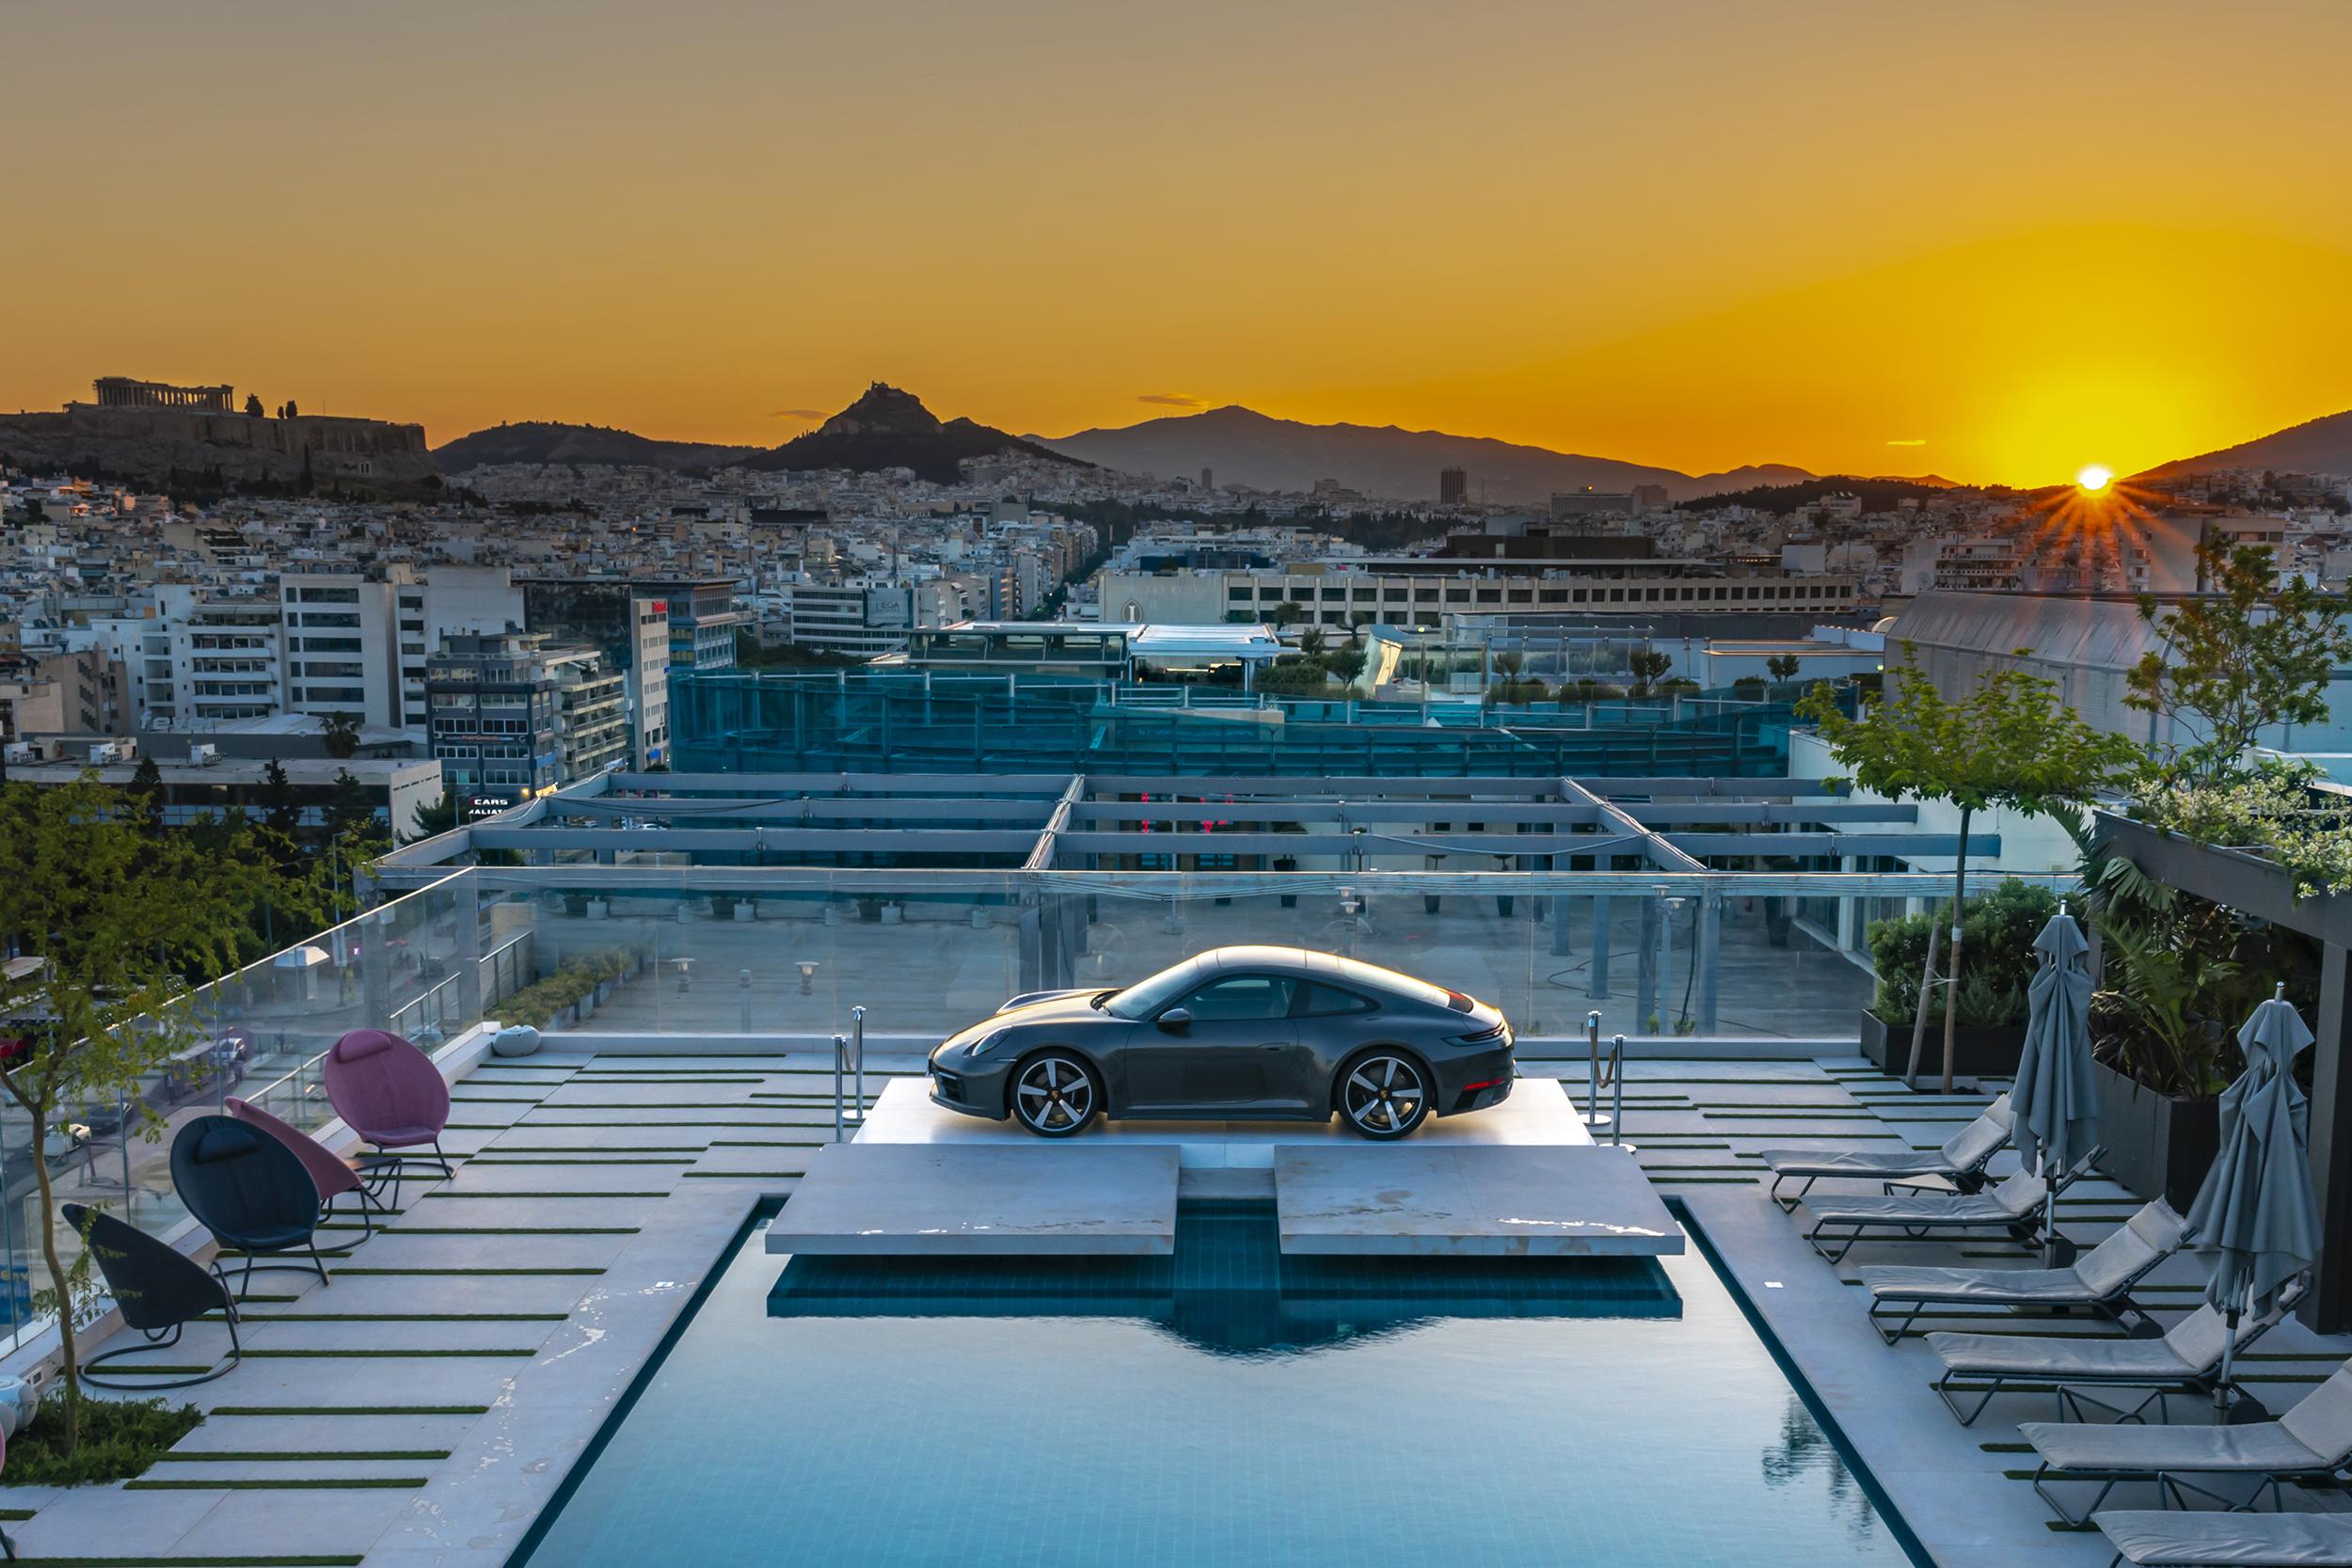 Porsche 911 on Grand Hyatt Hotel